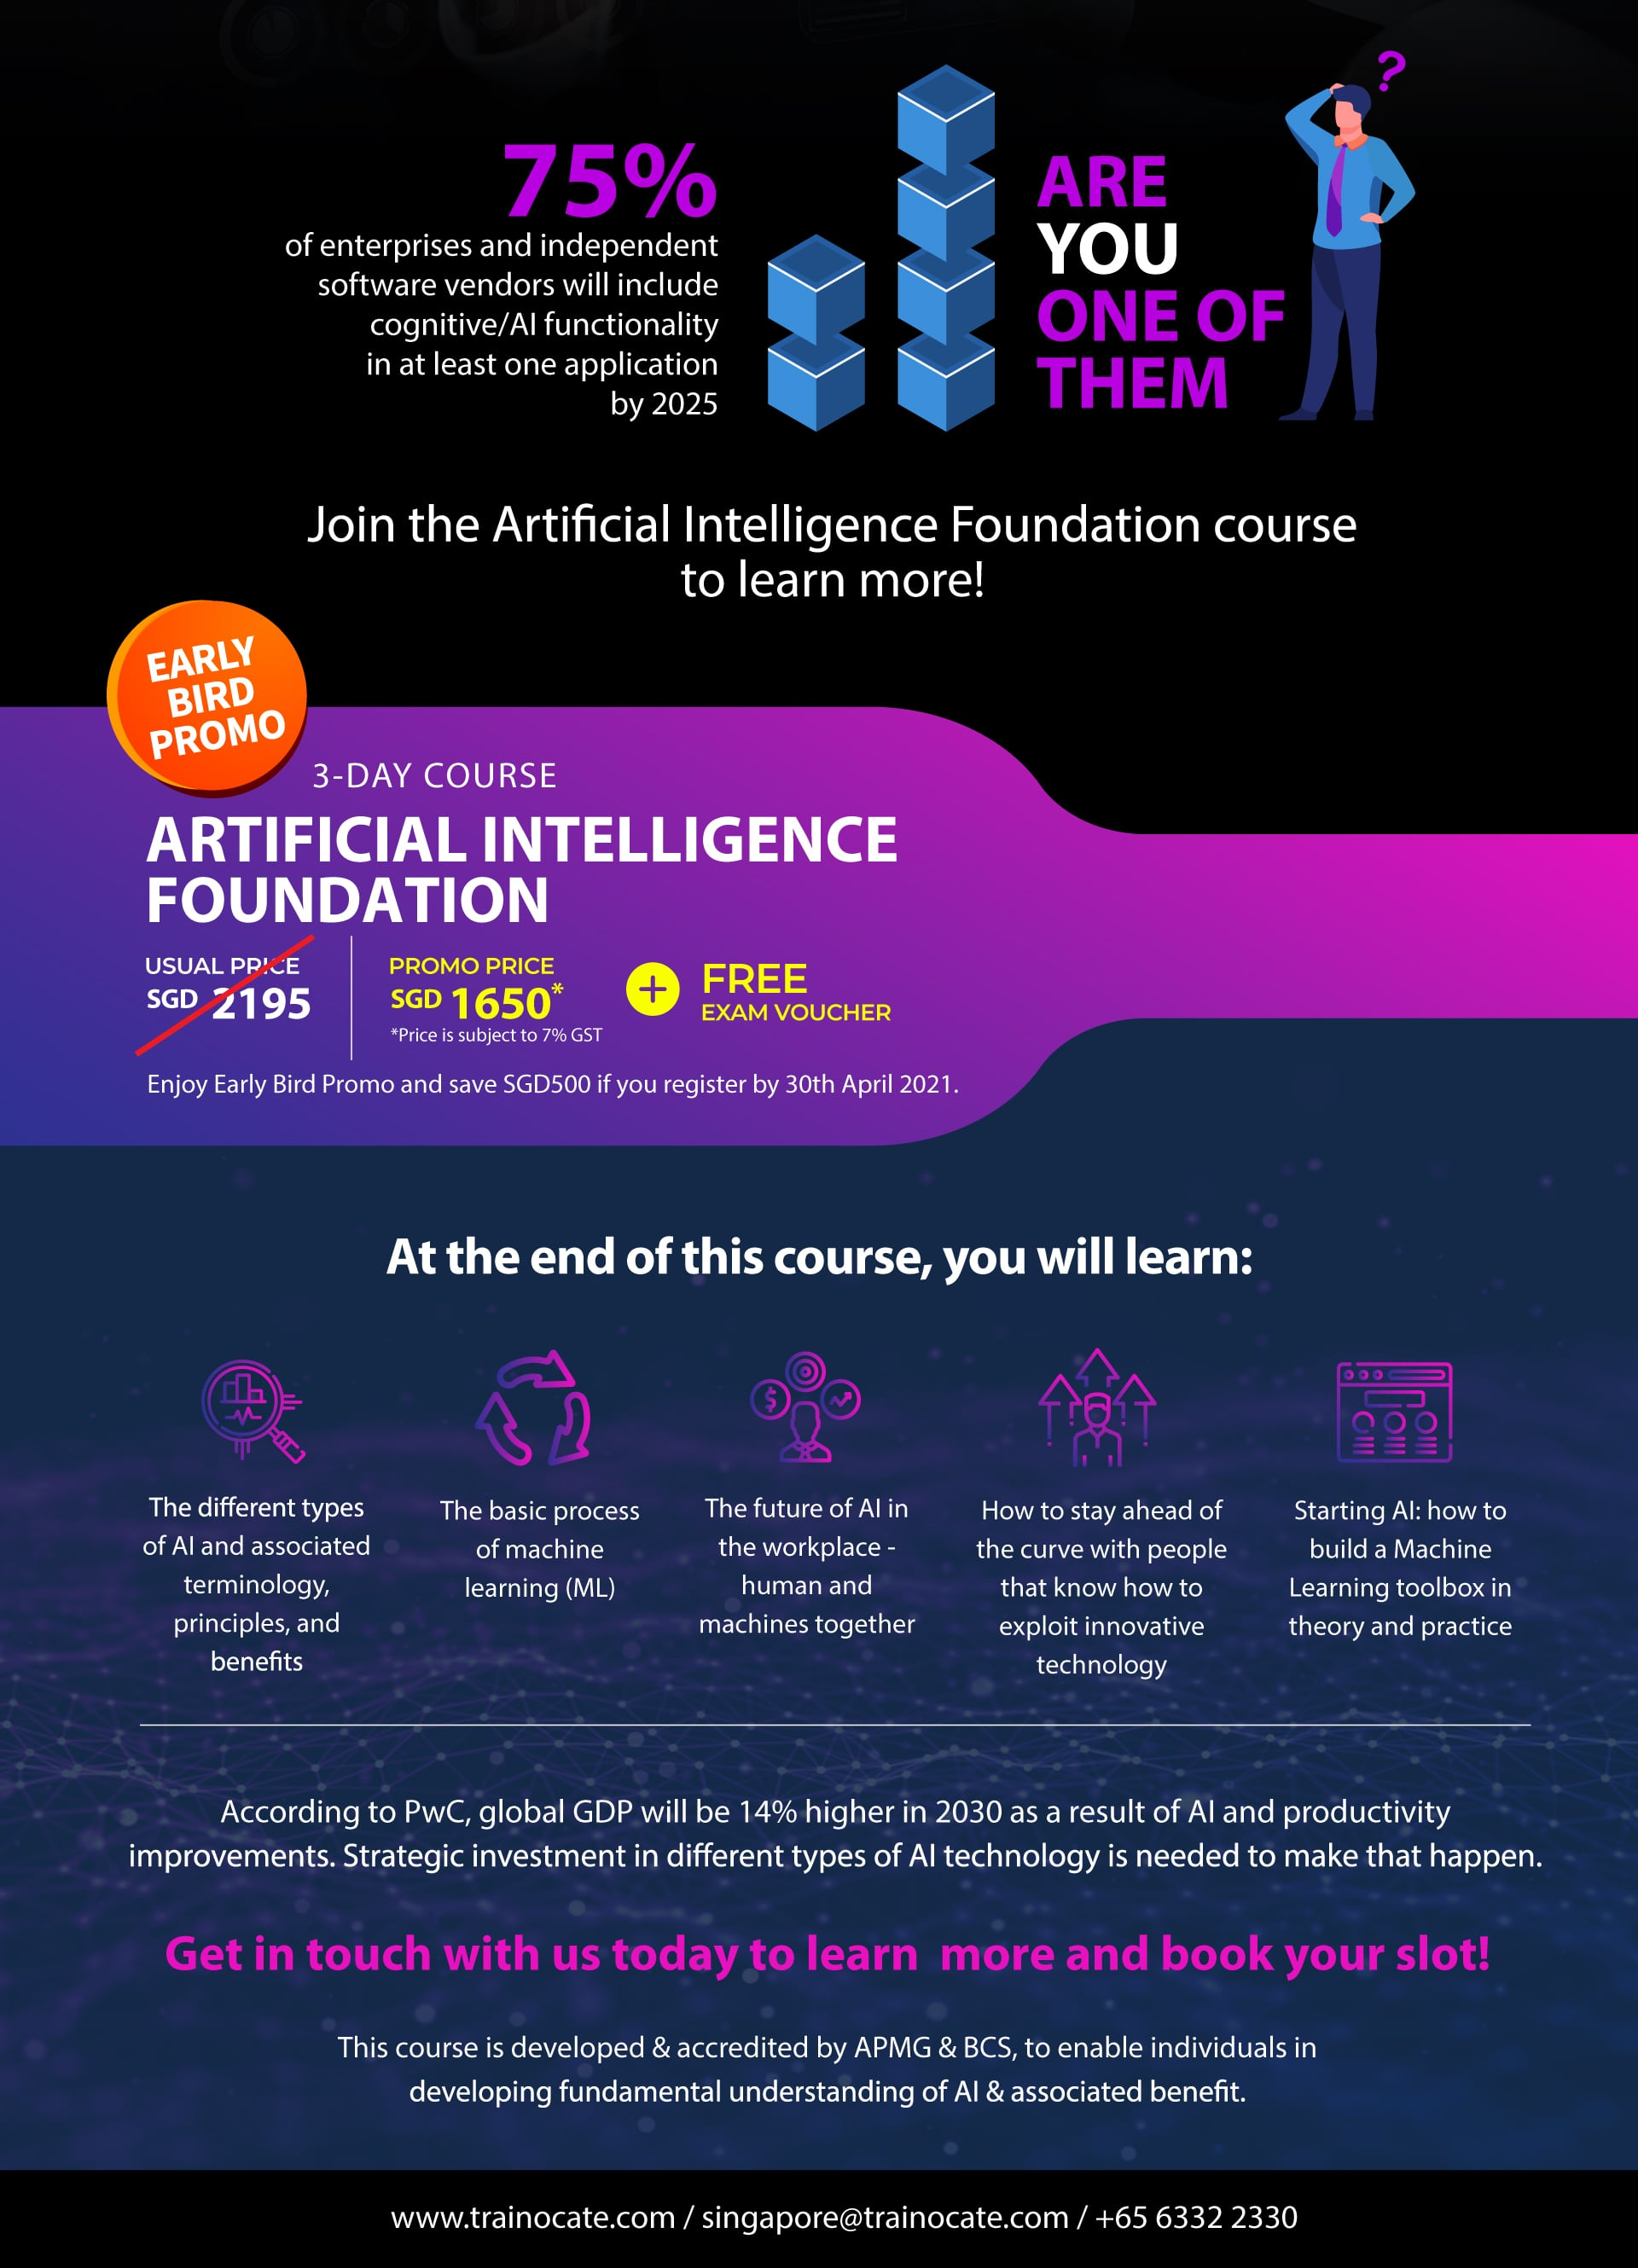 Artificial-Intelligence-Foundation-full